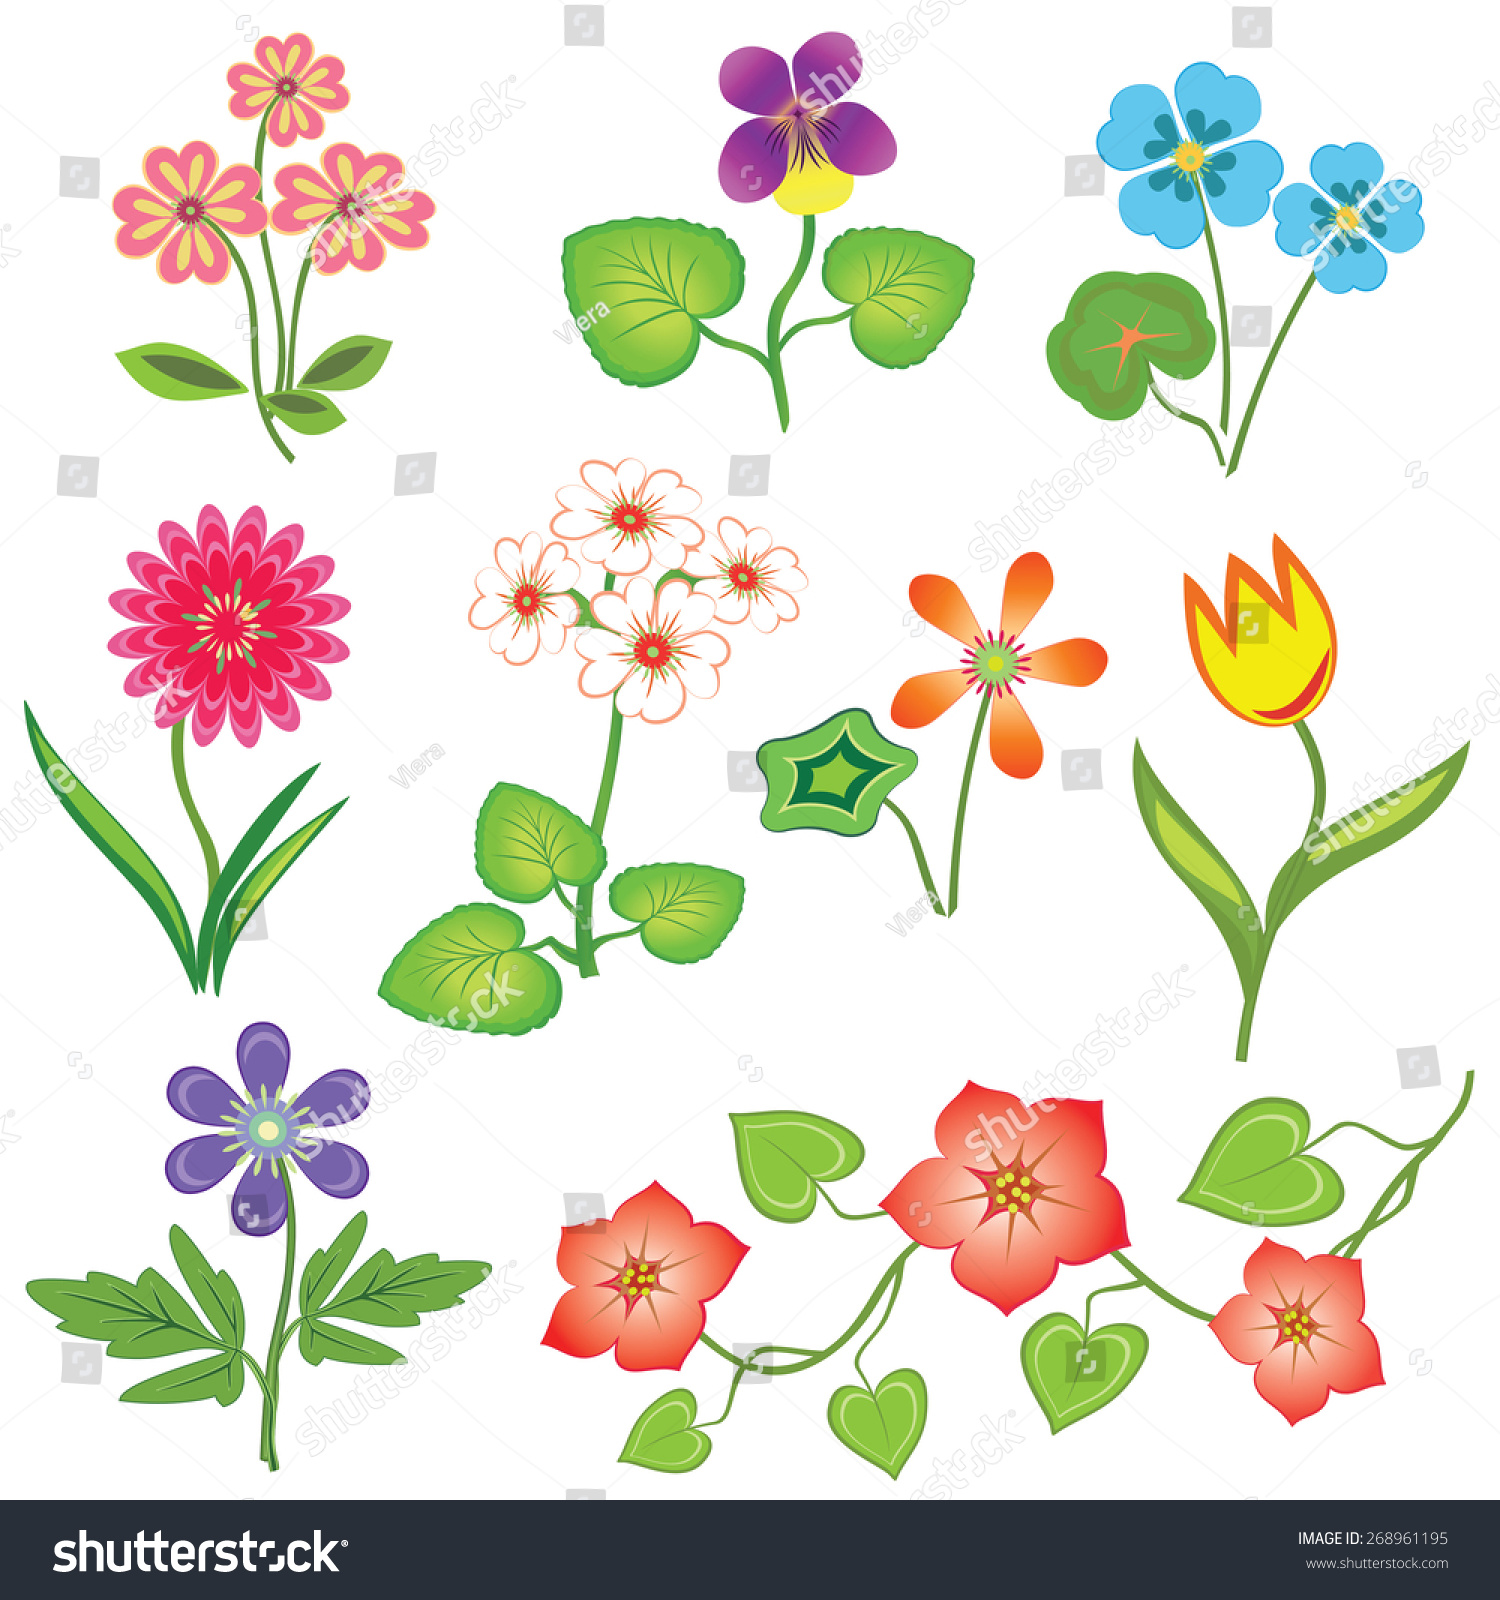 Royalty free nasturtium primula viola anemone 268961195 nasturtium primula viola anemone tulip gowan dog daisy petunia flower set spring flowers floral symbols with leaves color icons biocorpaavc